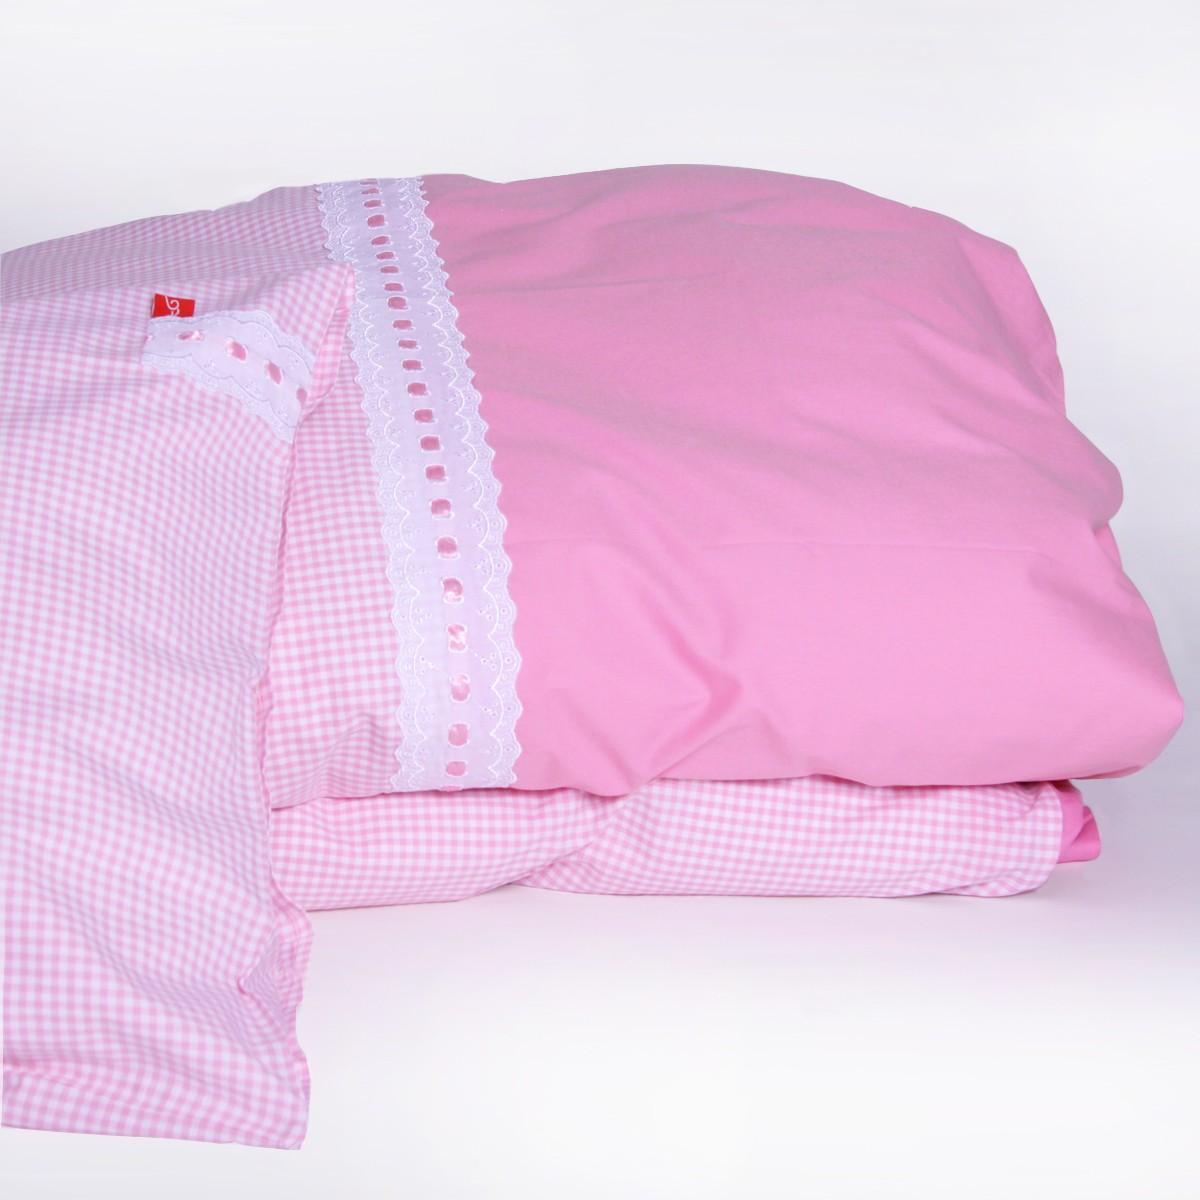 Dekbedovertrek romantic pink limited edition